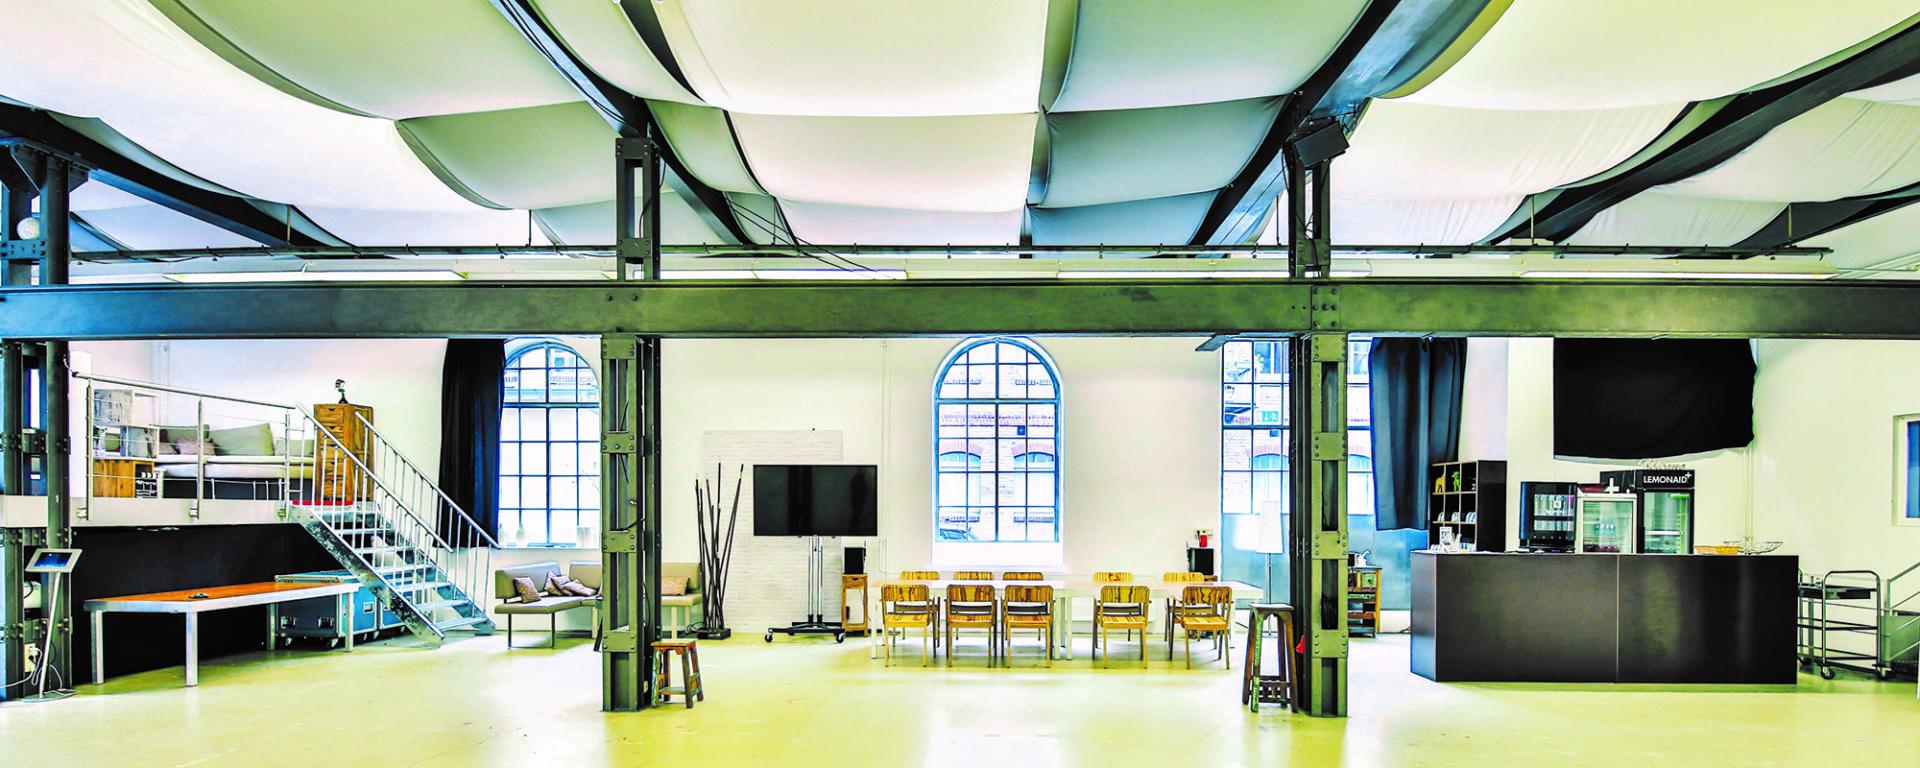 BAUER & GUSE GmbH_MIC_6181_2000x800